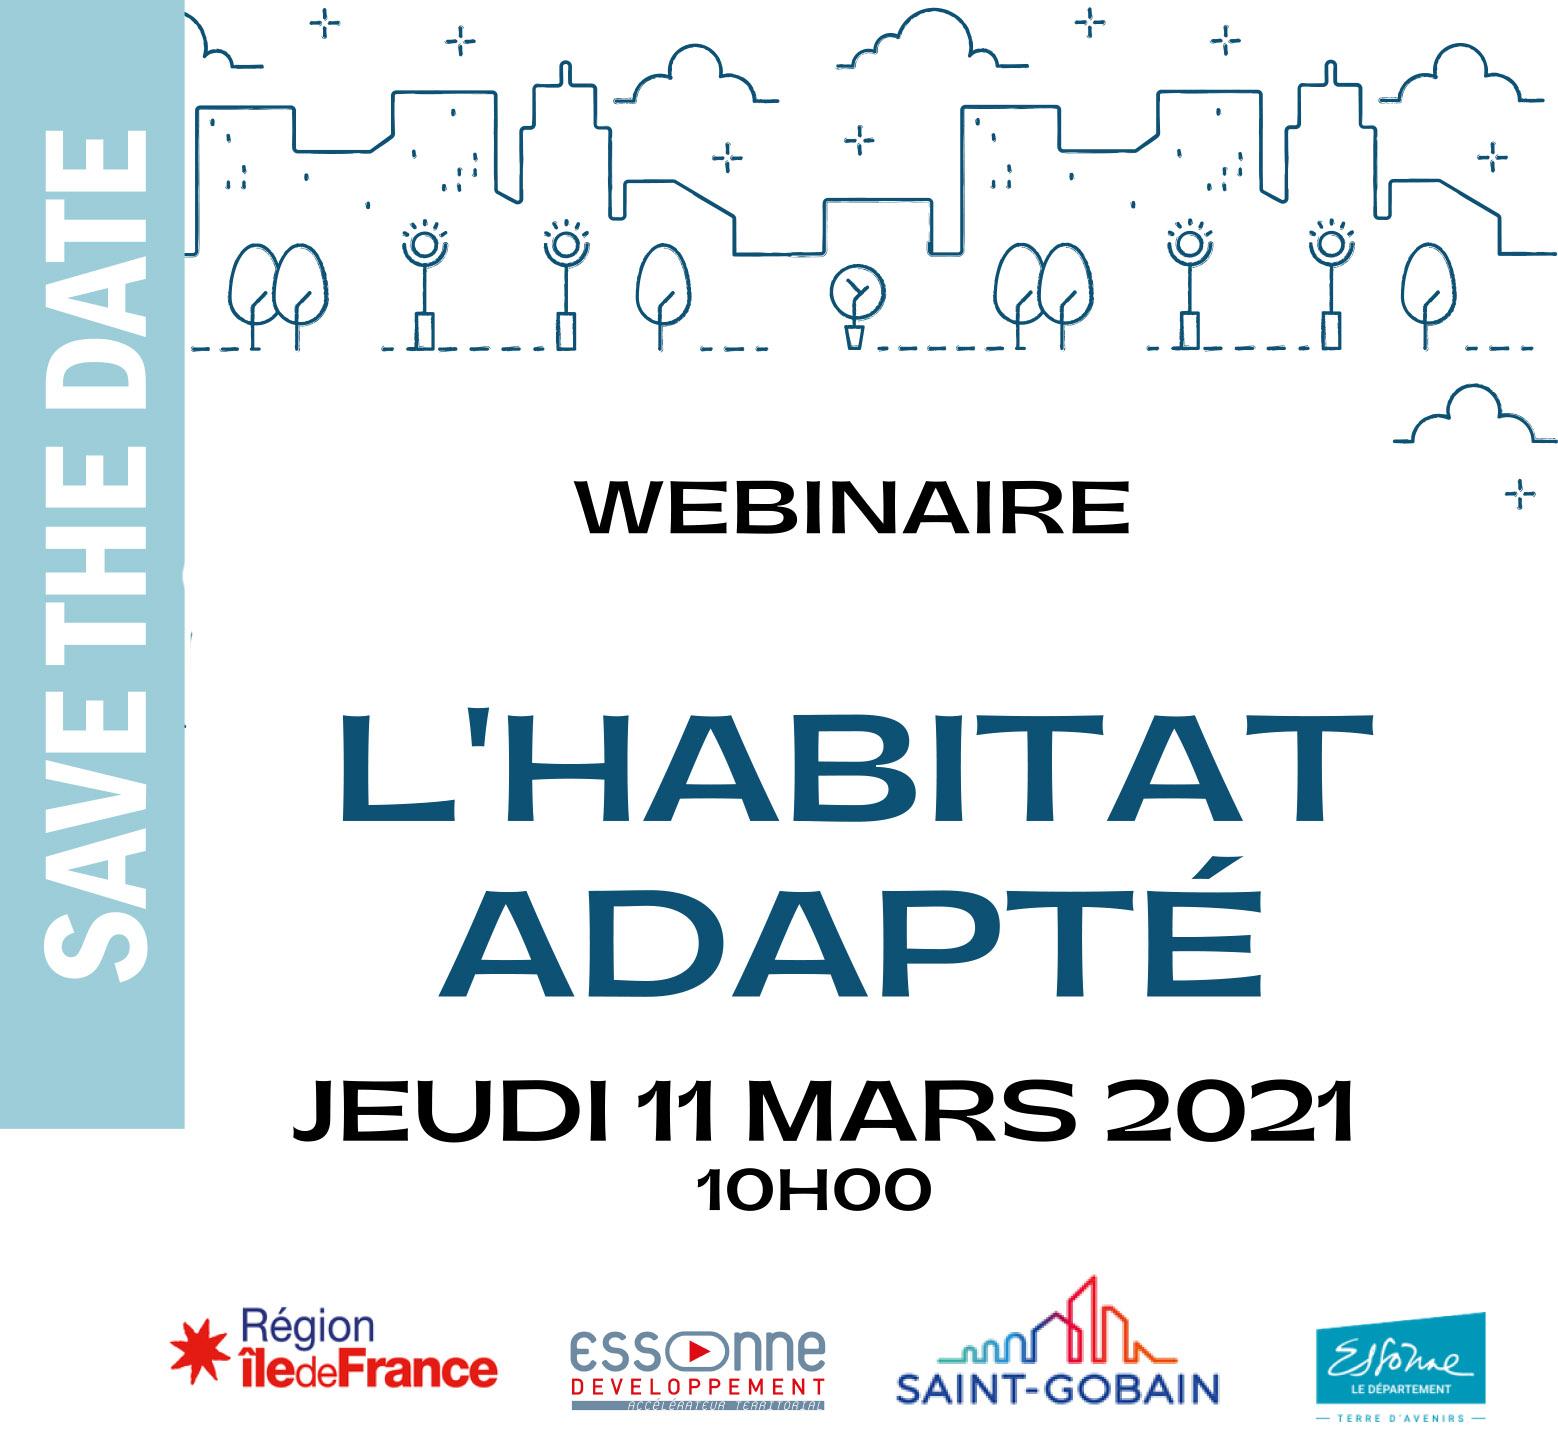 Webinaire-Habitat-adapte-11mars21